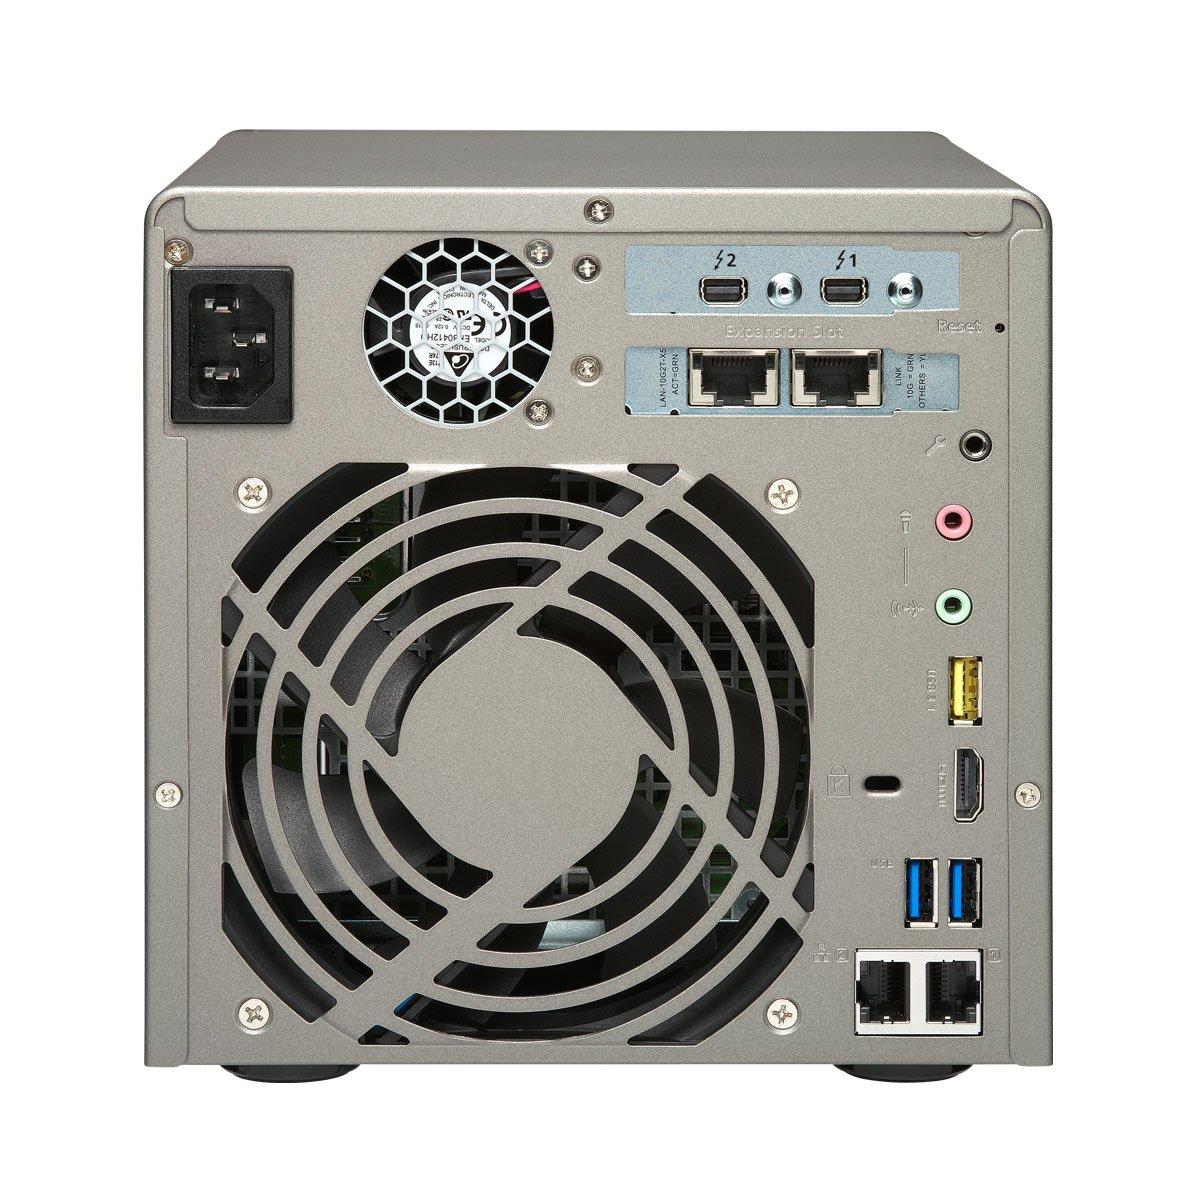 Qnap TVS-882ST2-i5-8G-US High Performance and Compact 8 bay Thunderbolt 2 DAS/NAS/iSCSI IP-SAN Solution by QNAP (Image #4)